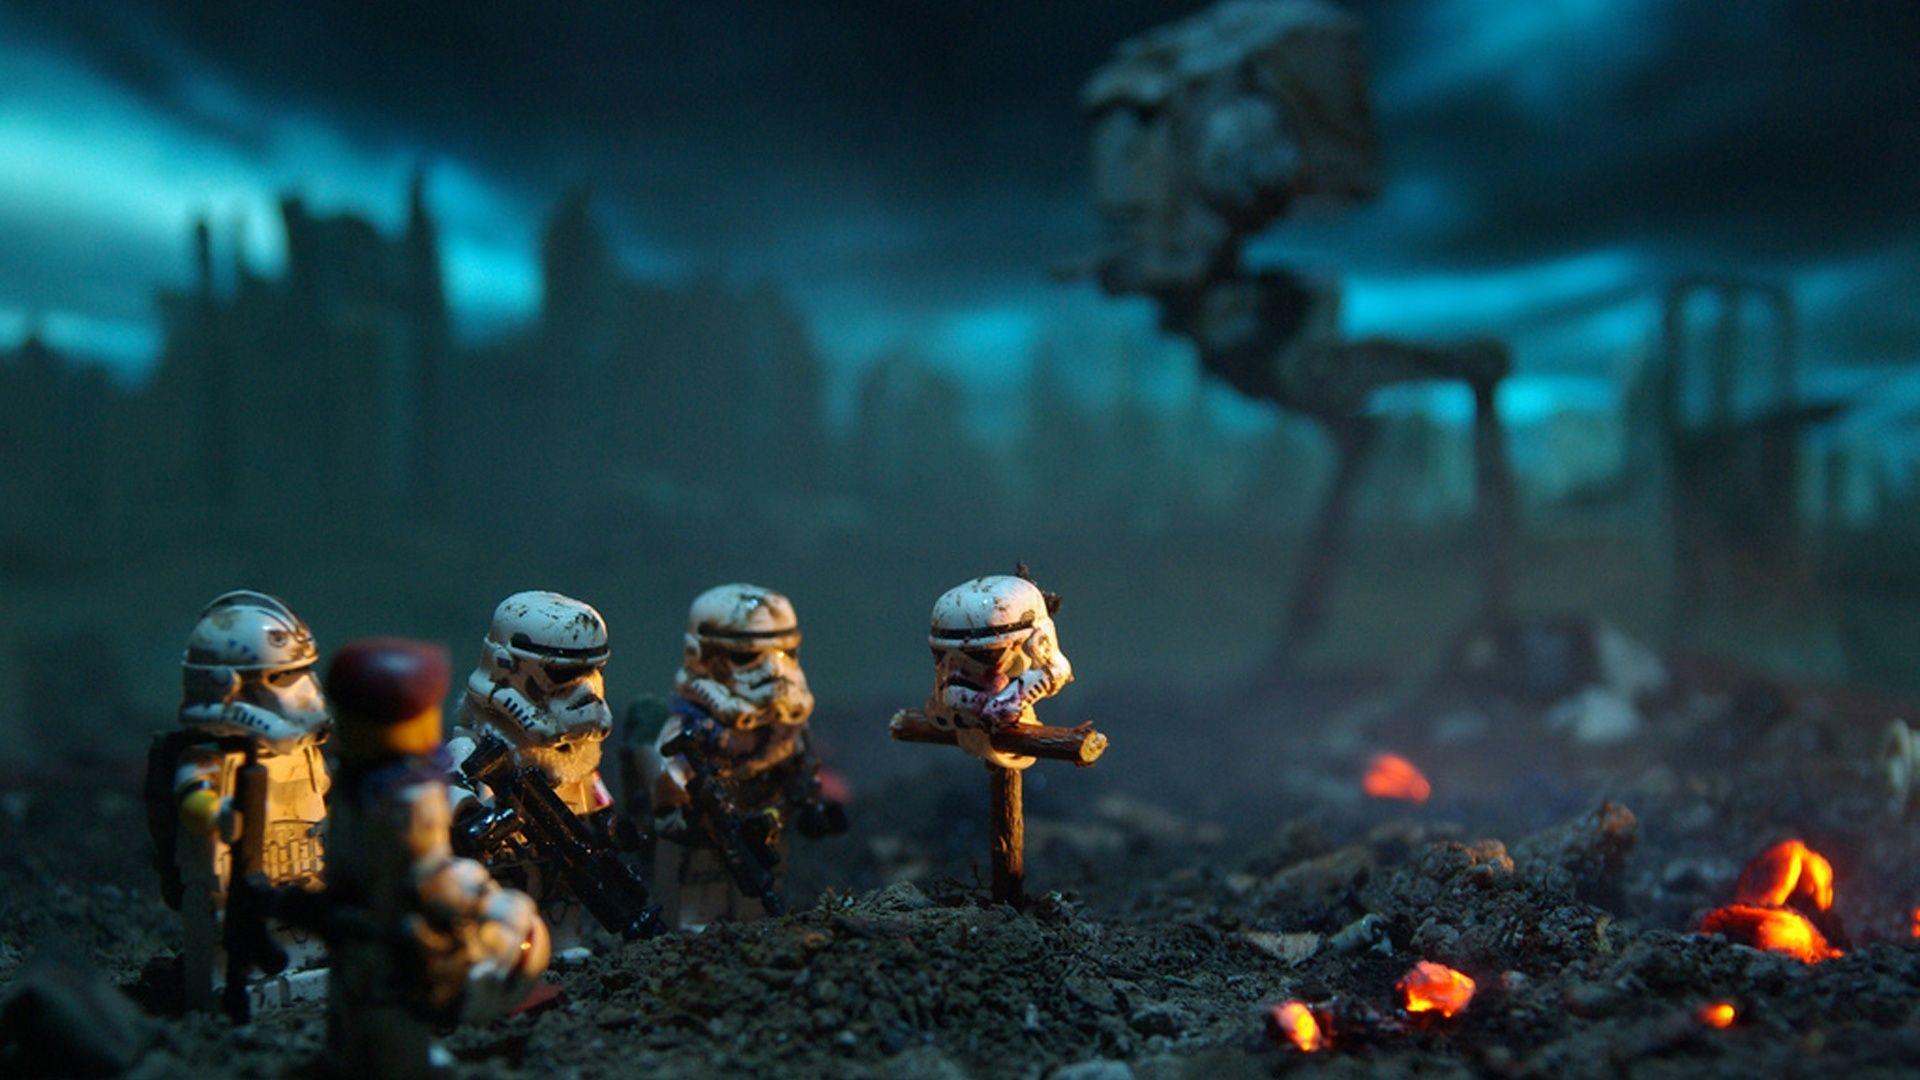 Lego Star Wars Wallpaper High Definition Free Download Star Wars